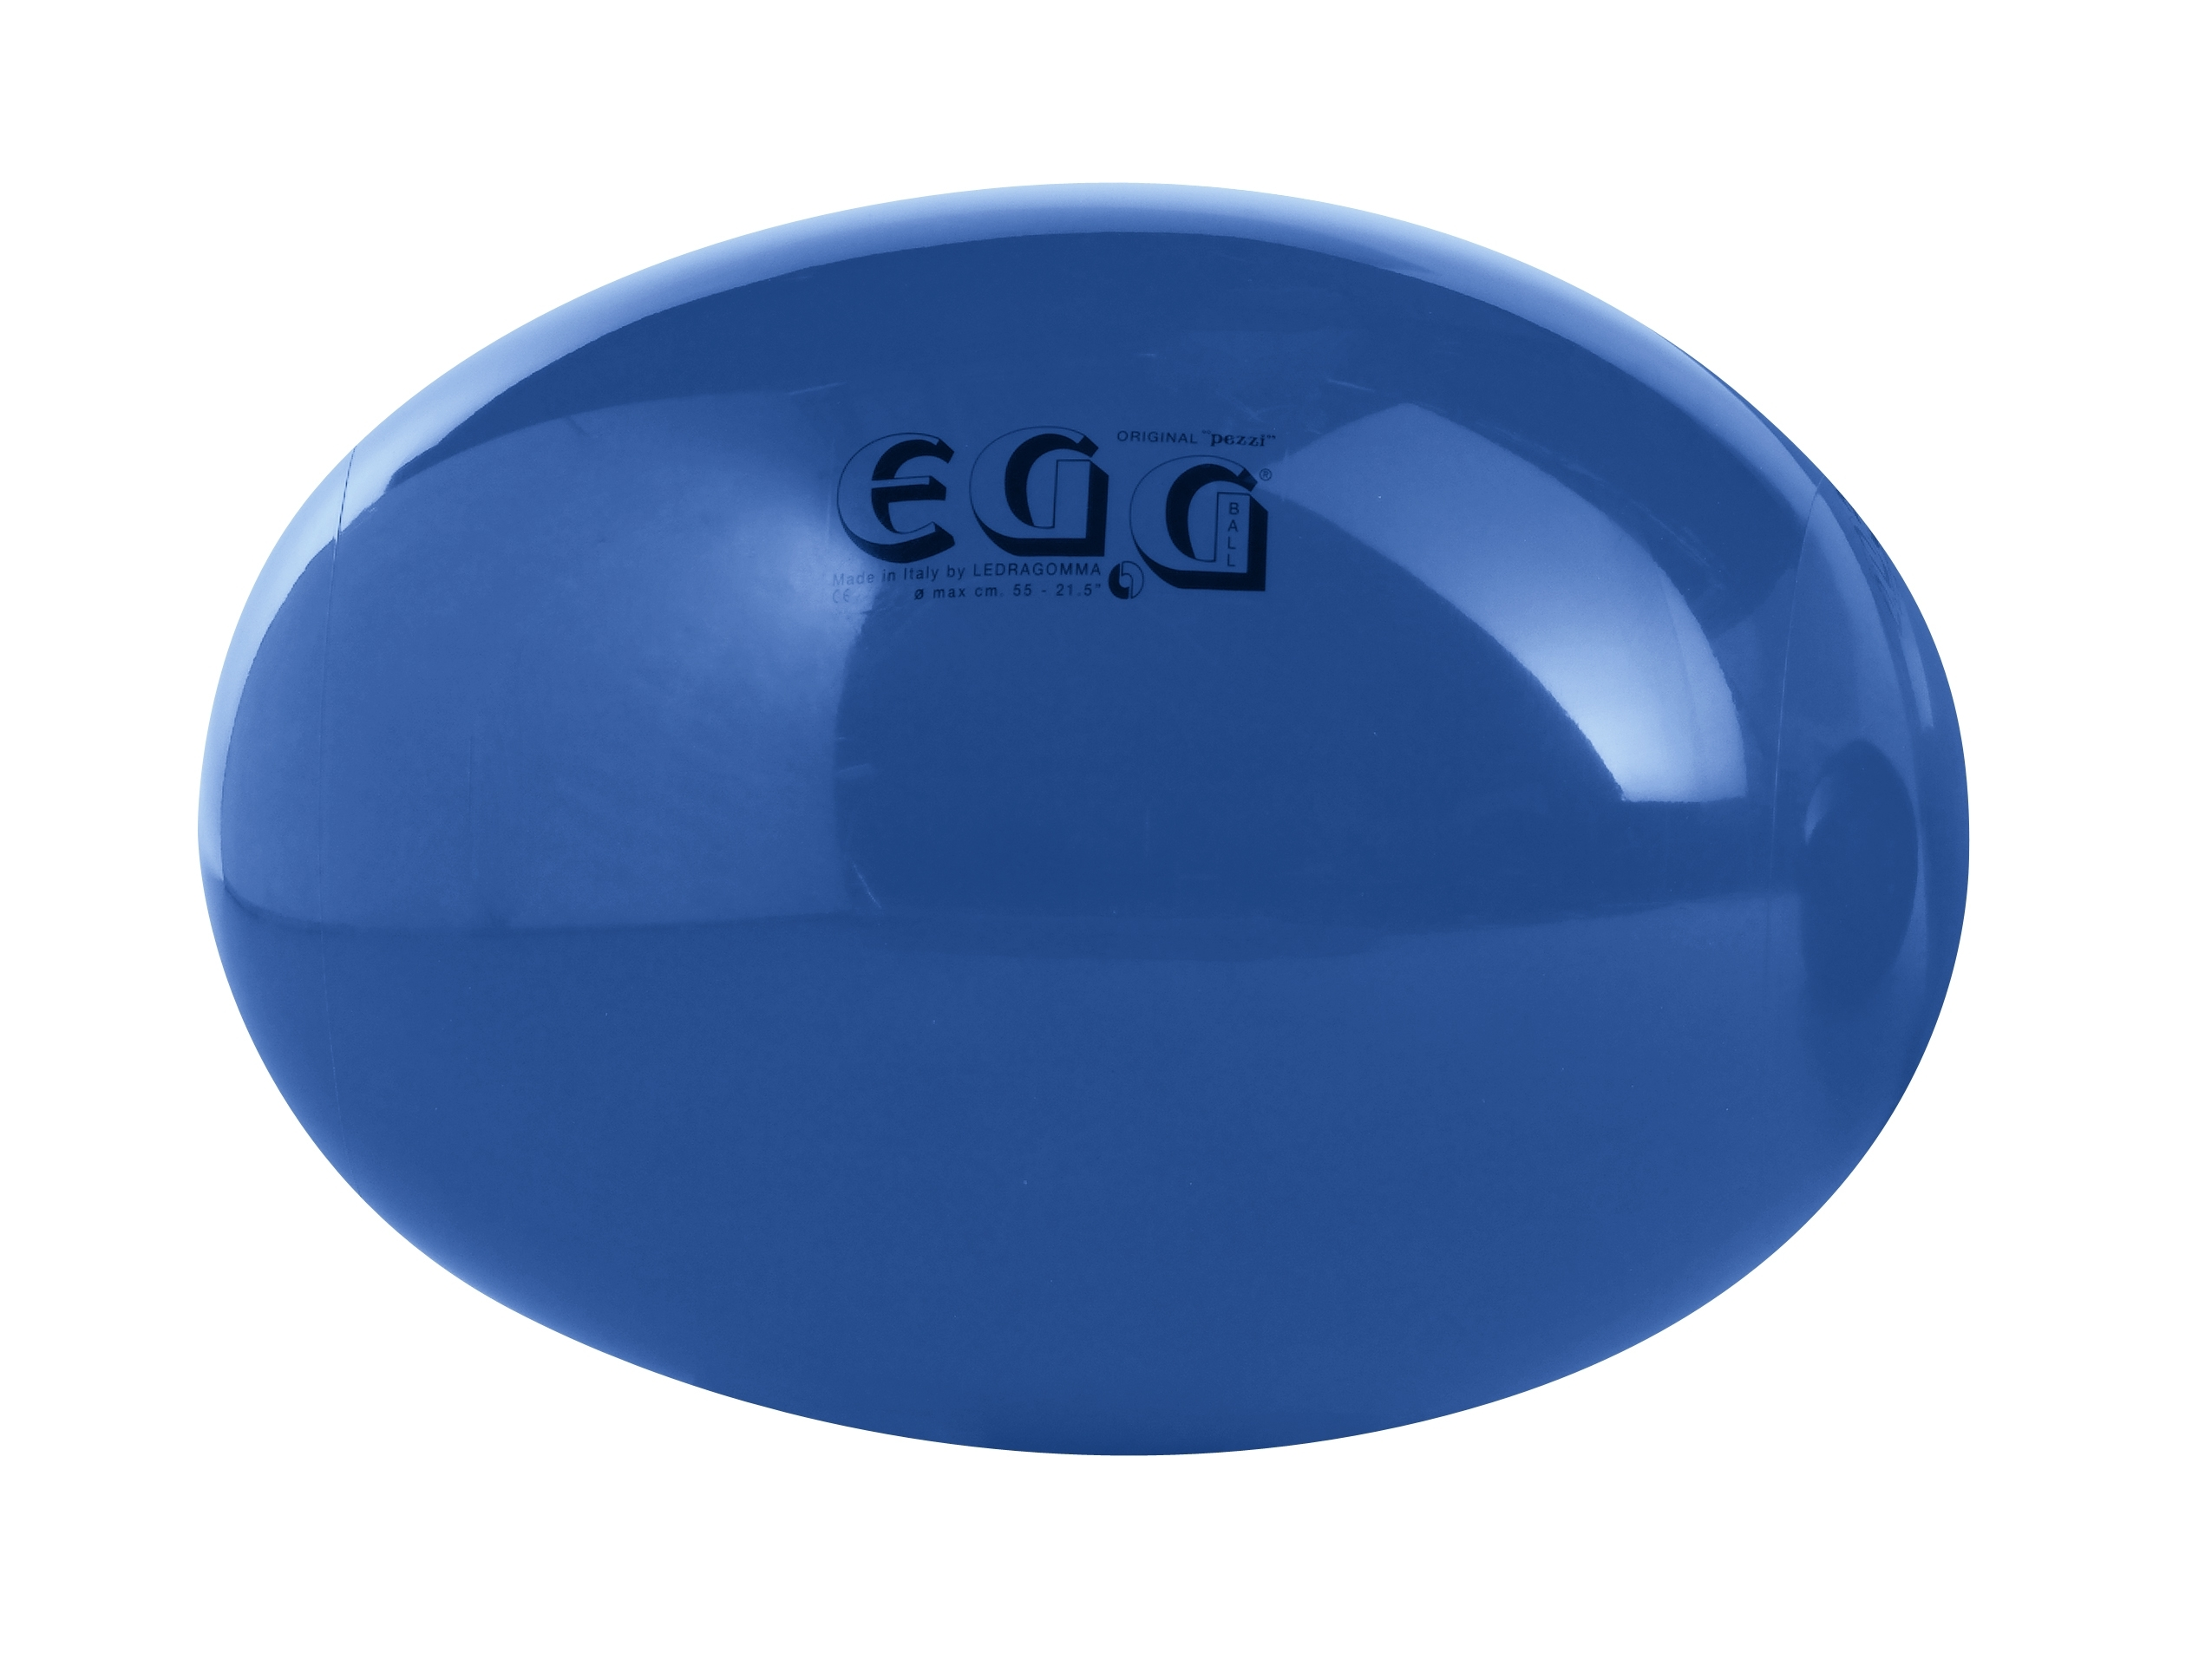 Pezzi-Eggball blau 85 cm